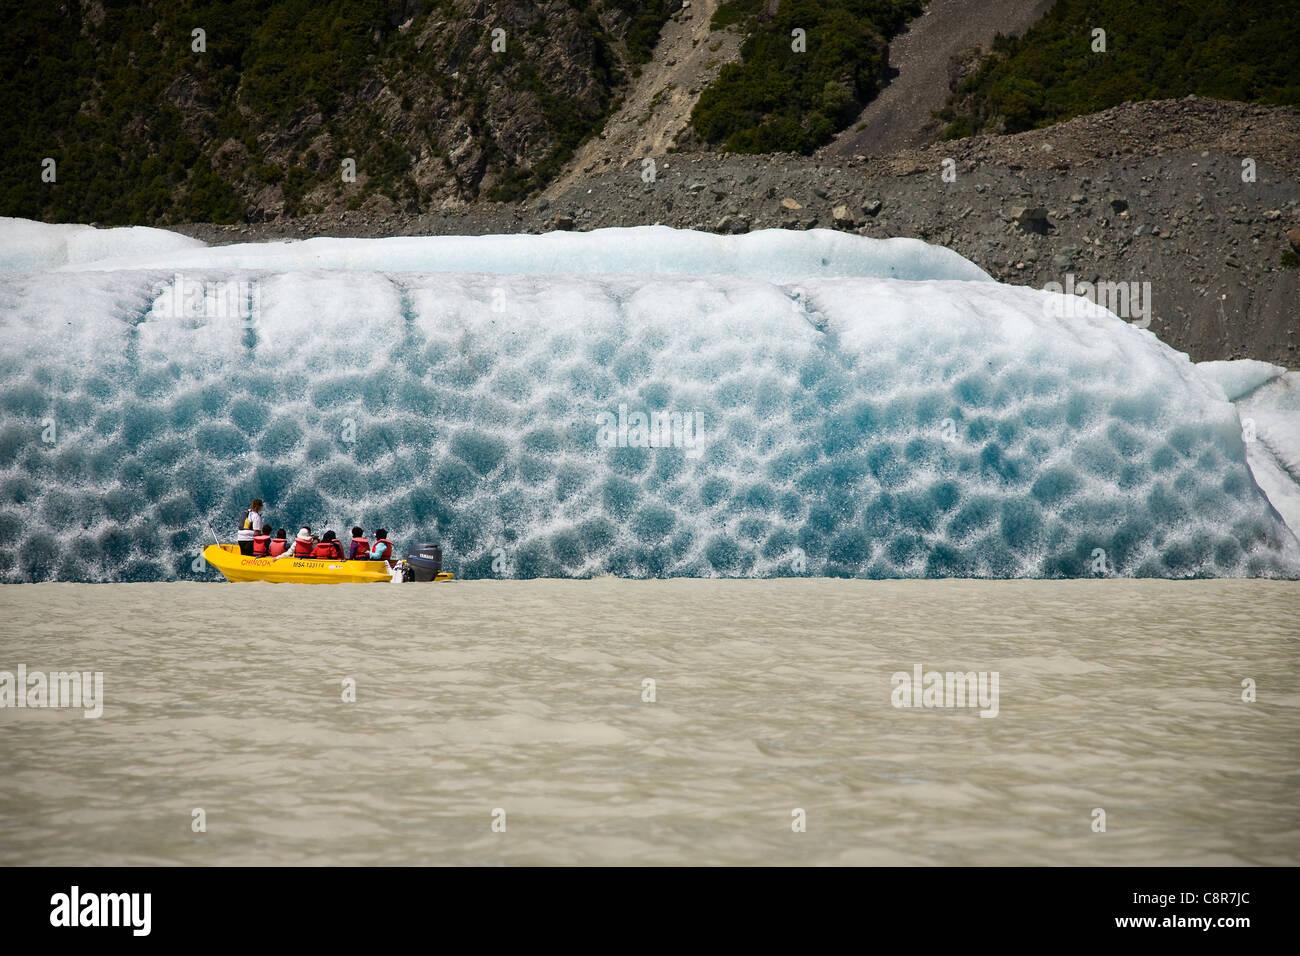 Tourists get close to an iceberg in the Tasman Glacier Terminal Lake, New Zealand Stock Photo